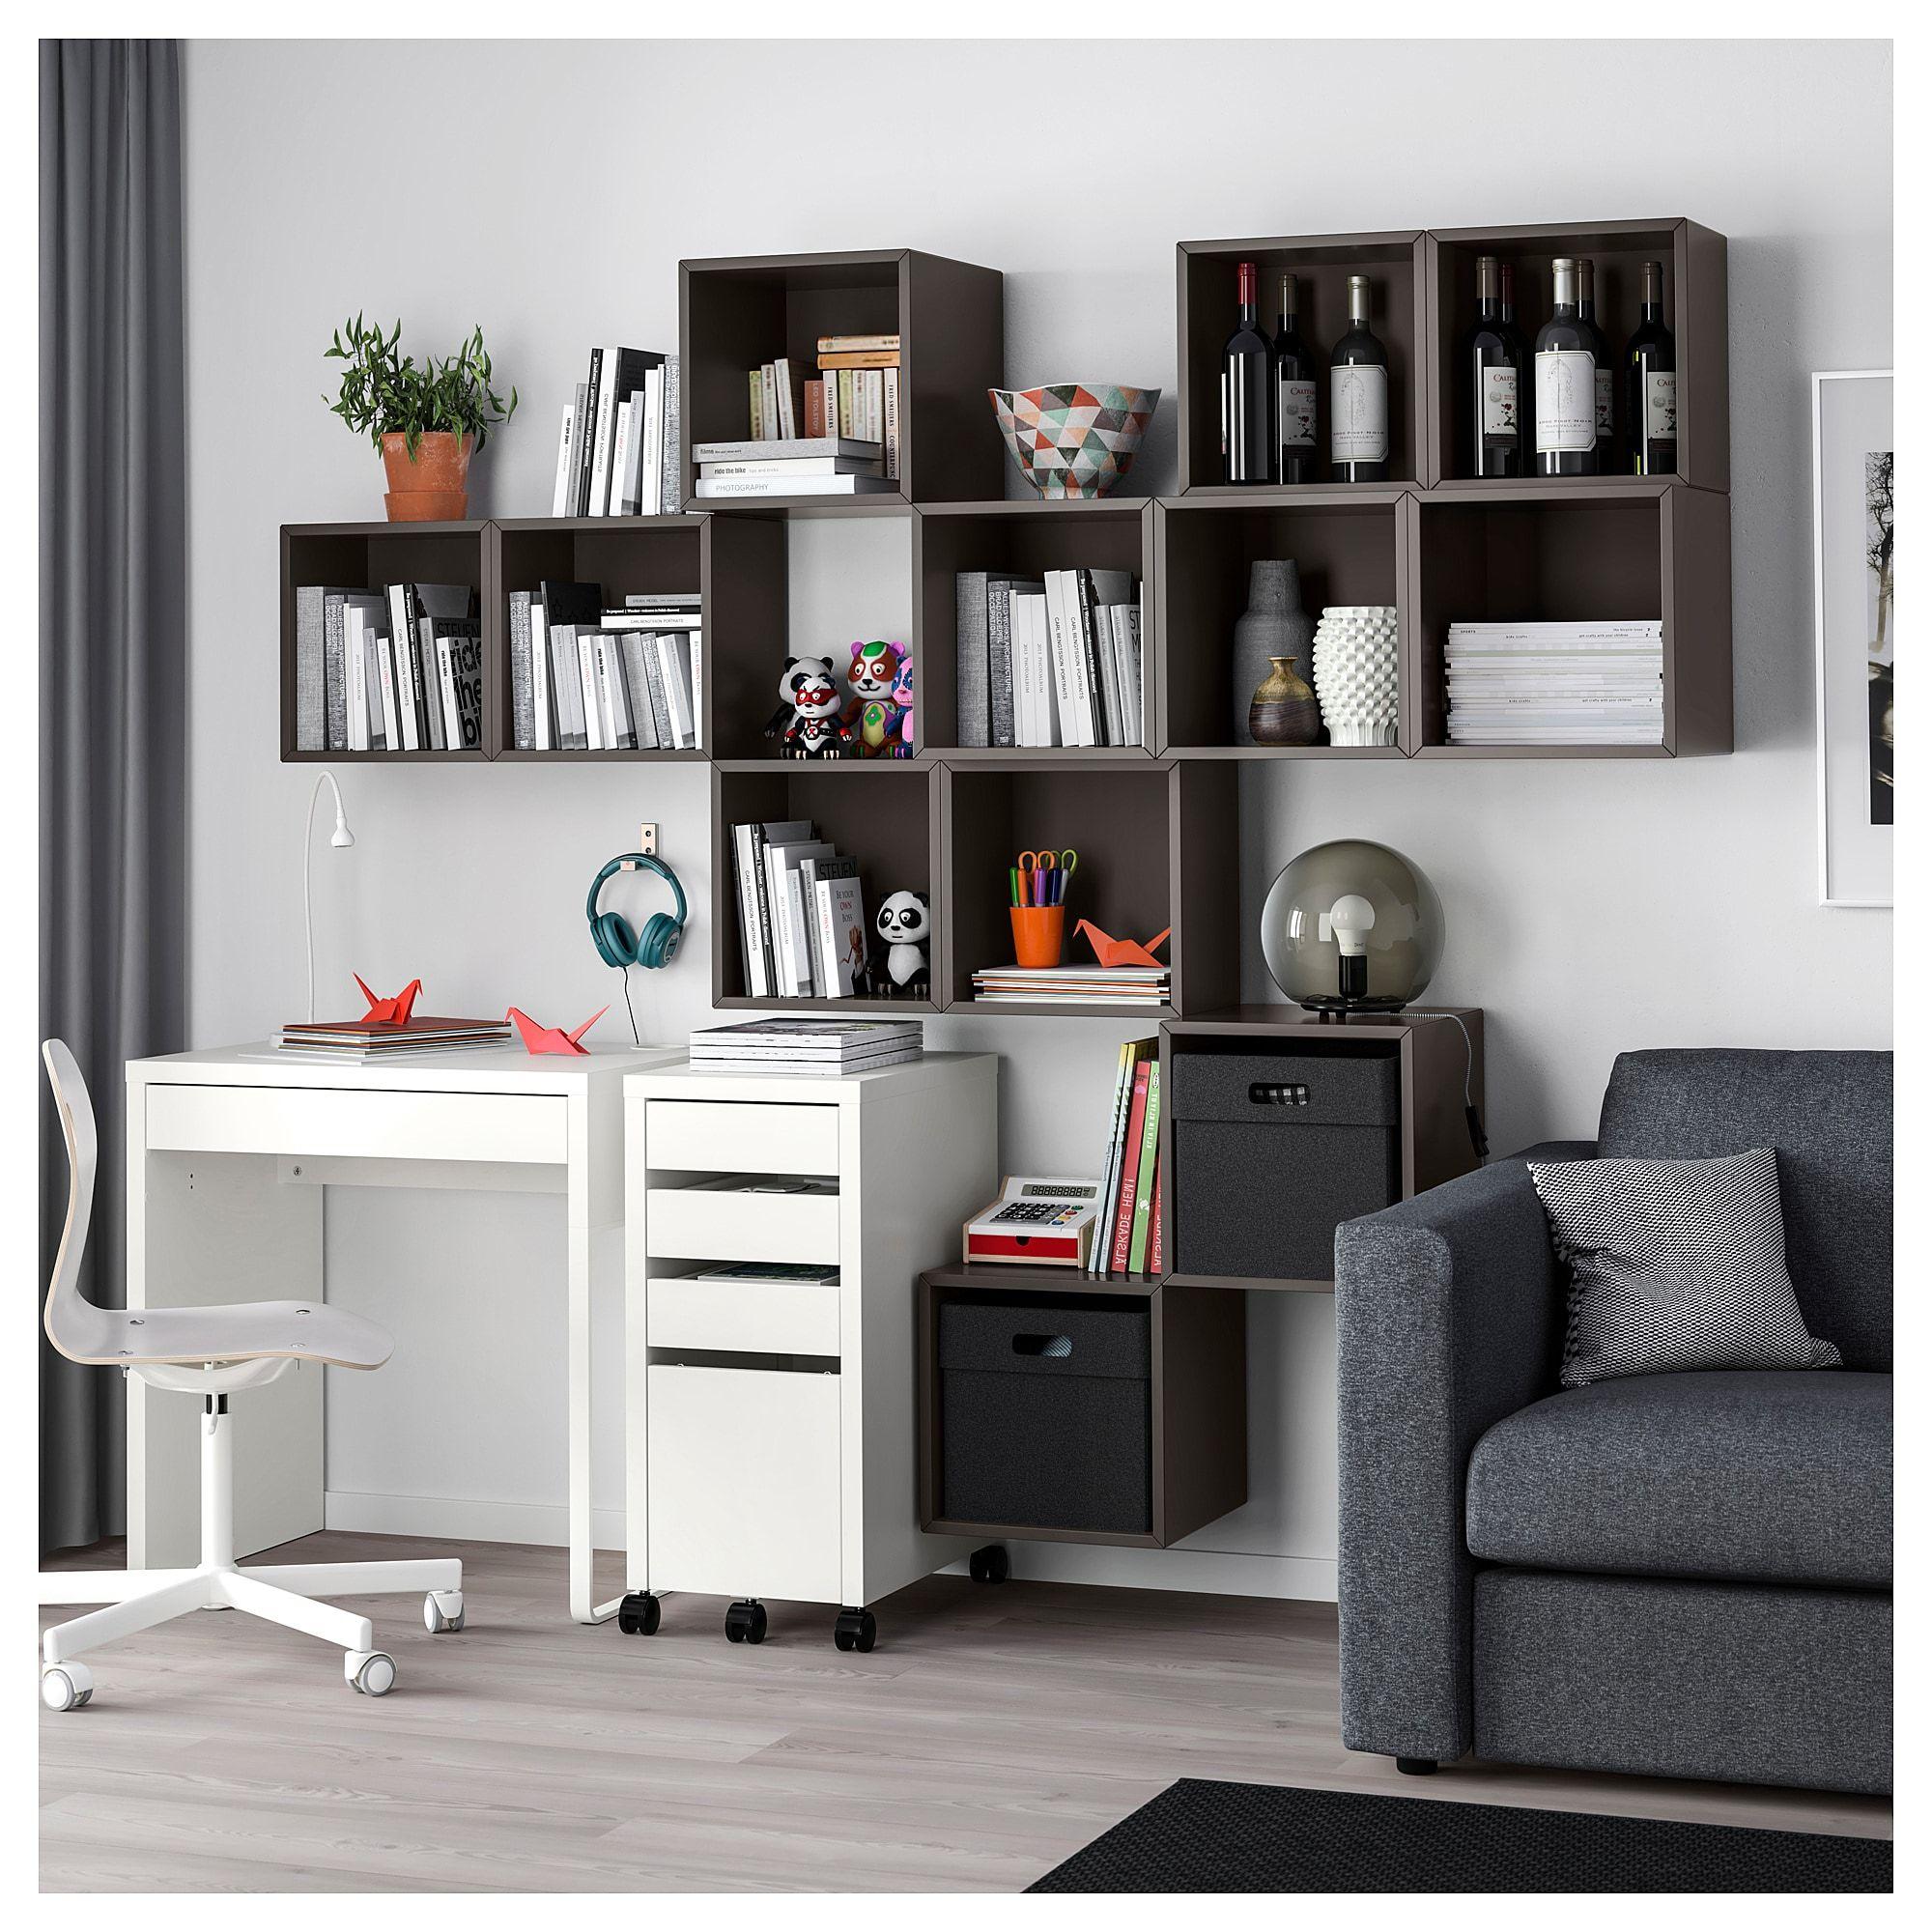 EKET Wall-mounted Cabinet Combination Dark Gray In